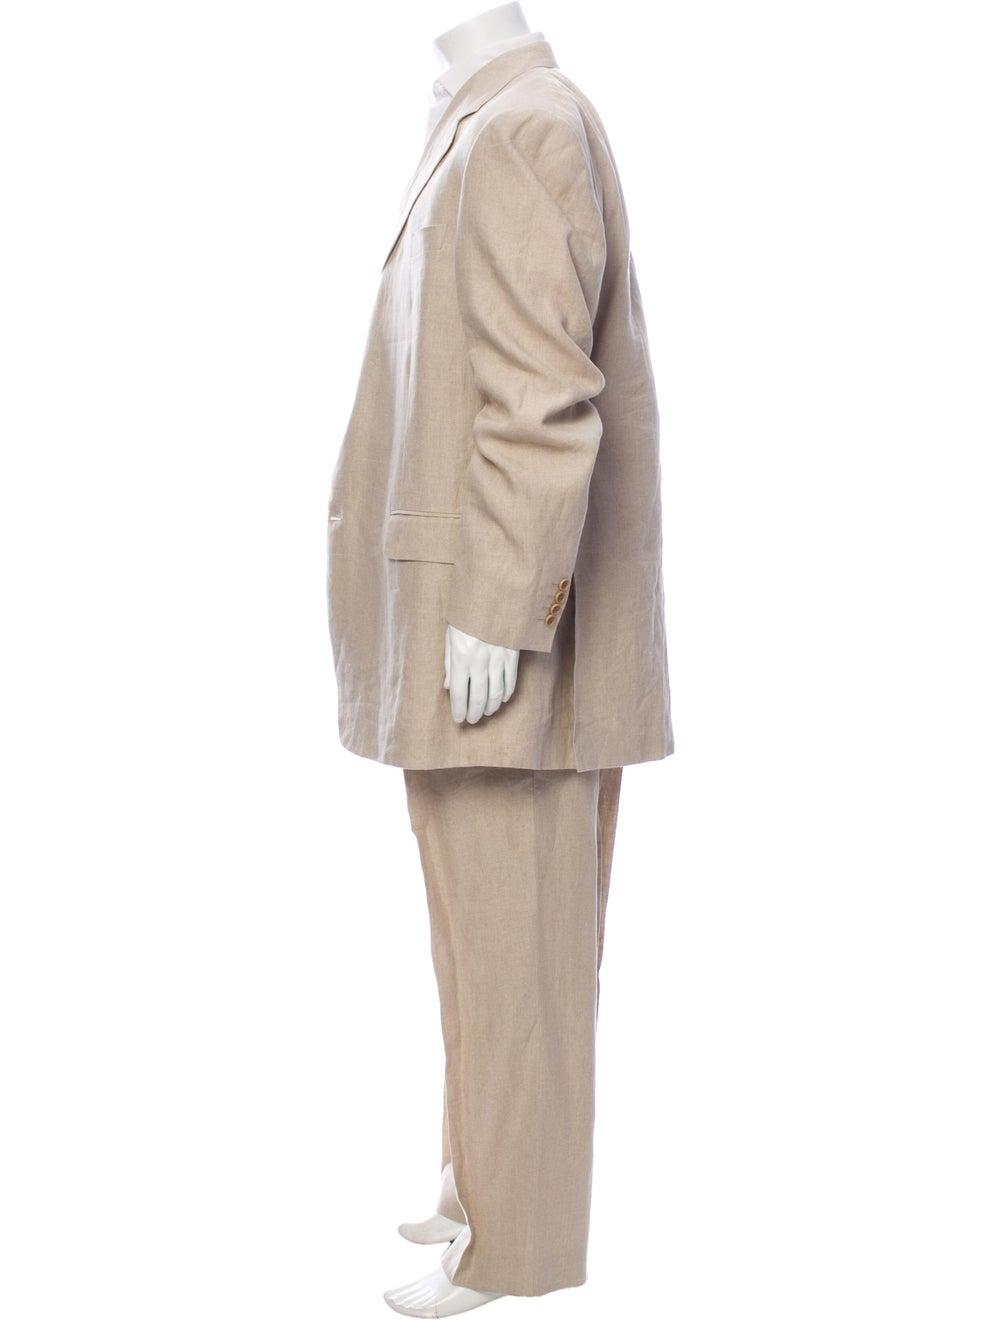 Canali Linen Two-Piece Suit - image 2